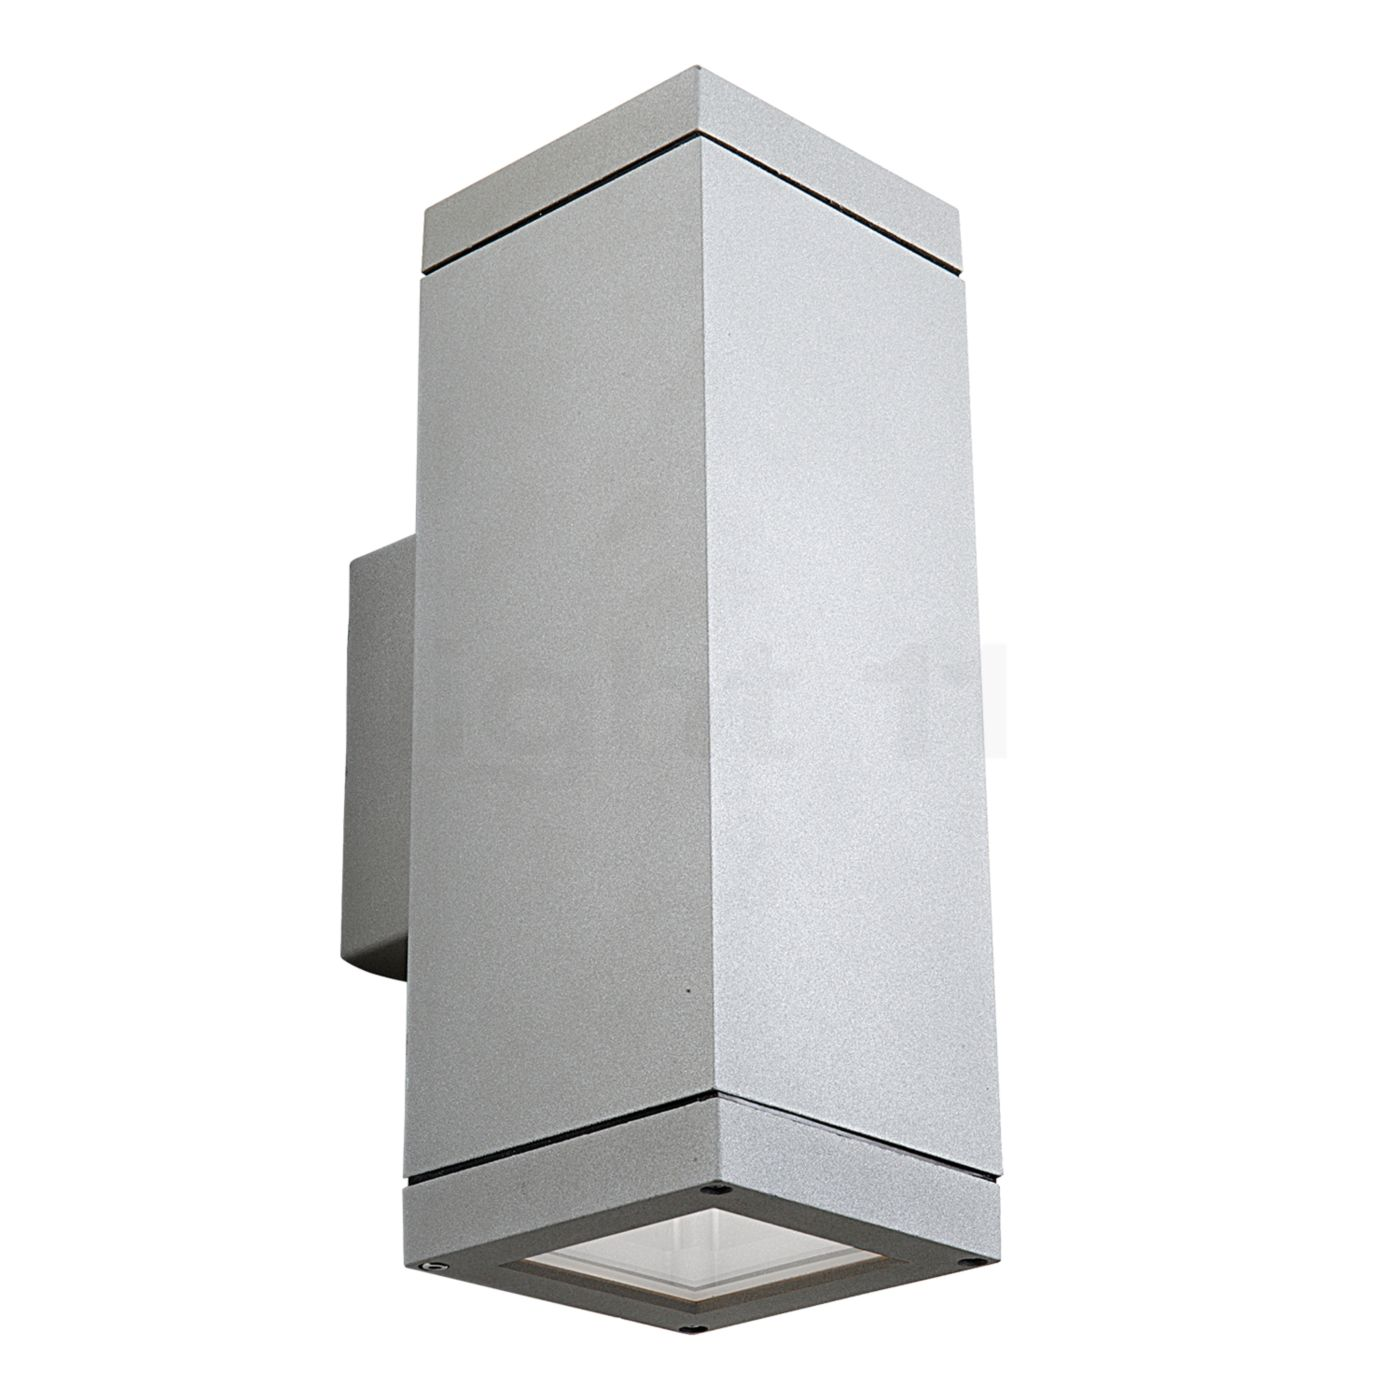 Afrodita_PAR_30_Up__Down_Vaeglampe_gra--076b216eed35d320652c90aa9e18c7c2 Faszinierend Up Down Lampe Dekorationen